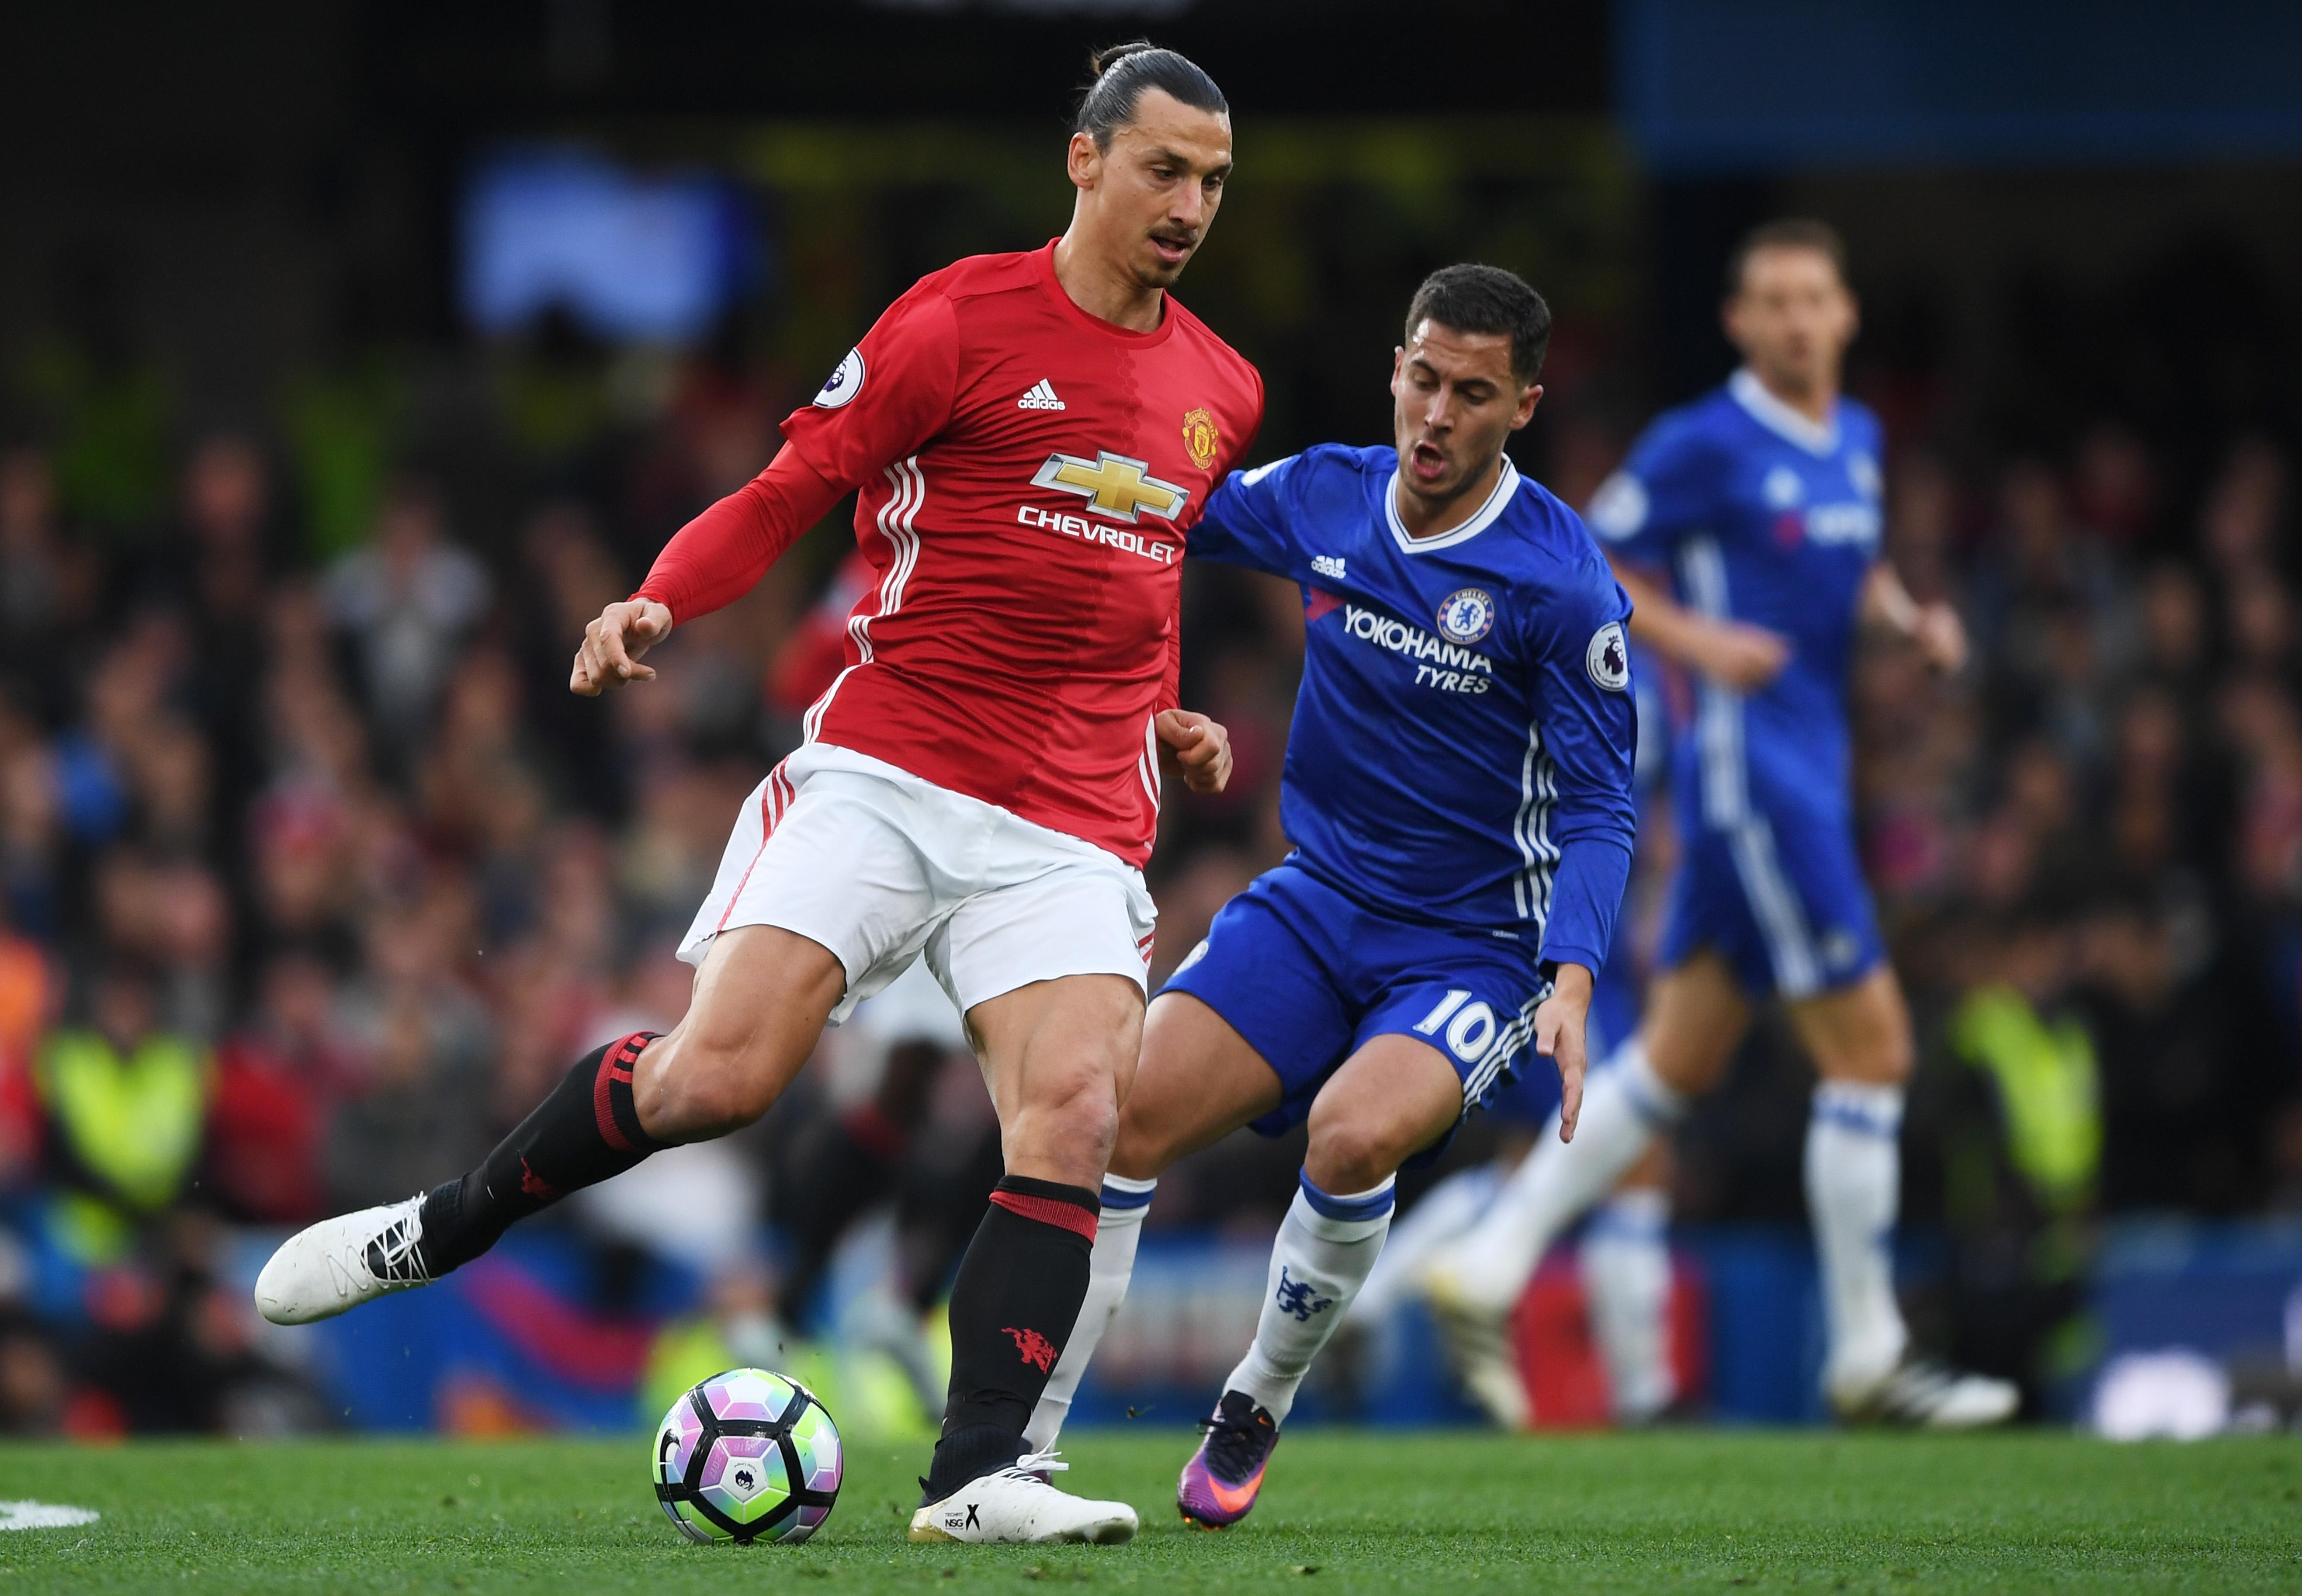 Zlatan Ibrahimovic Eden Hazard Chelsea Manchester United 23102016